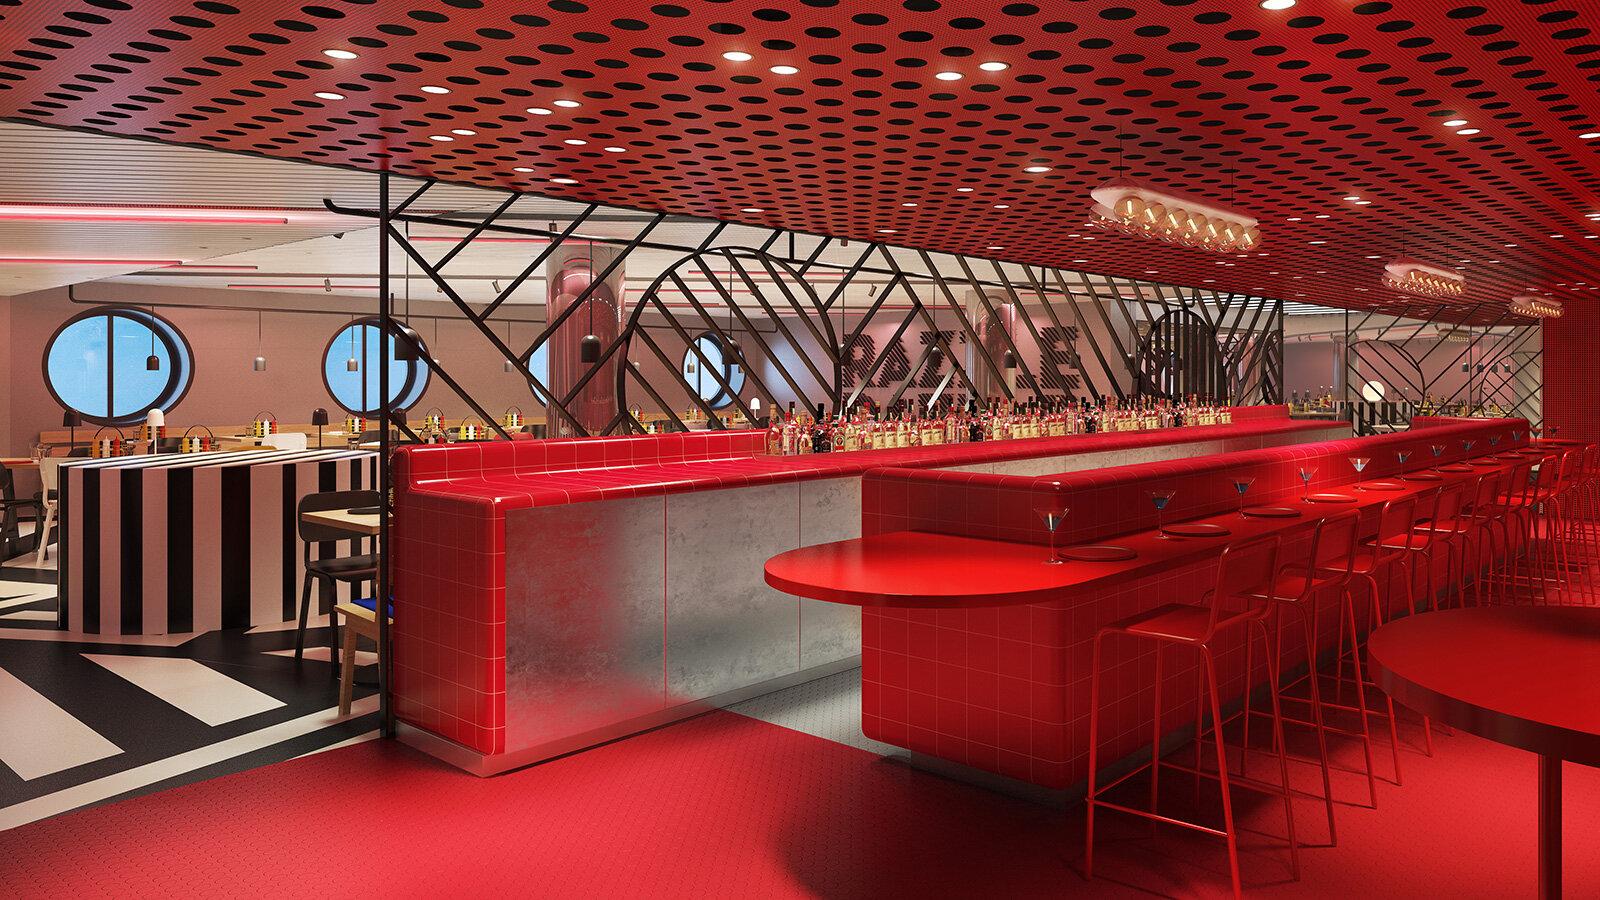 RDR-FNB-razzle-dazzle-restaurant-american-bar-v1-01-1600x900.jpg